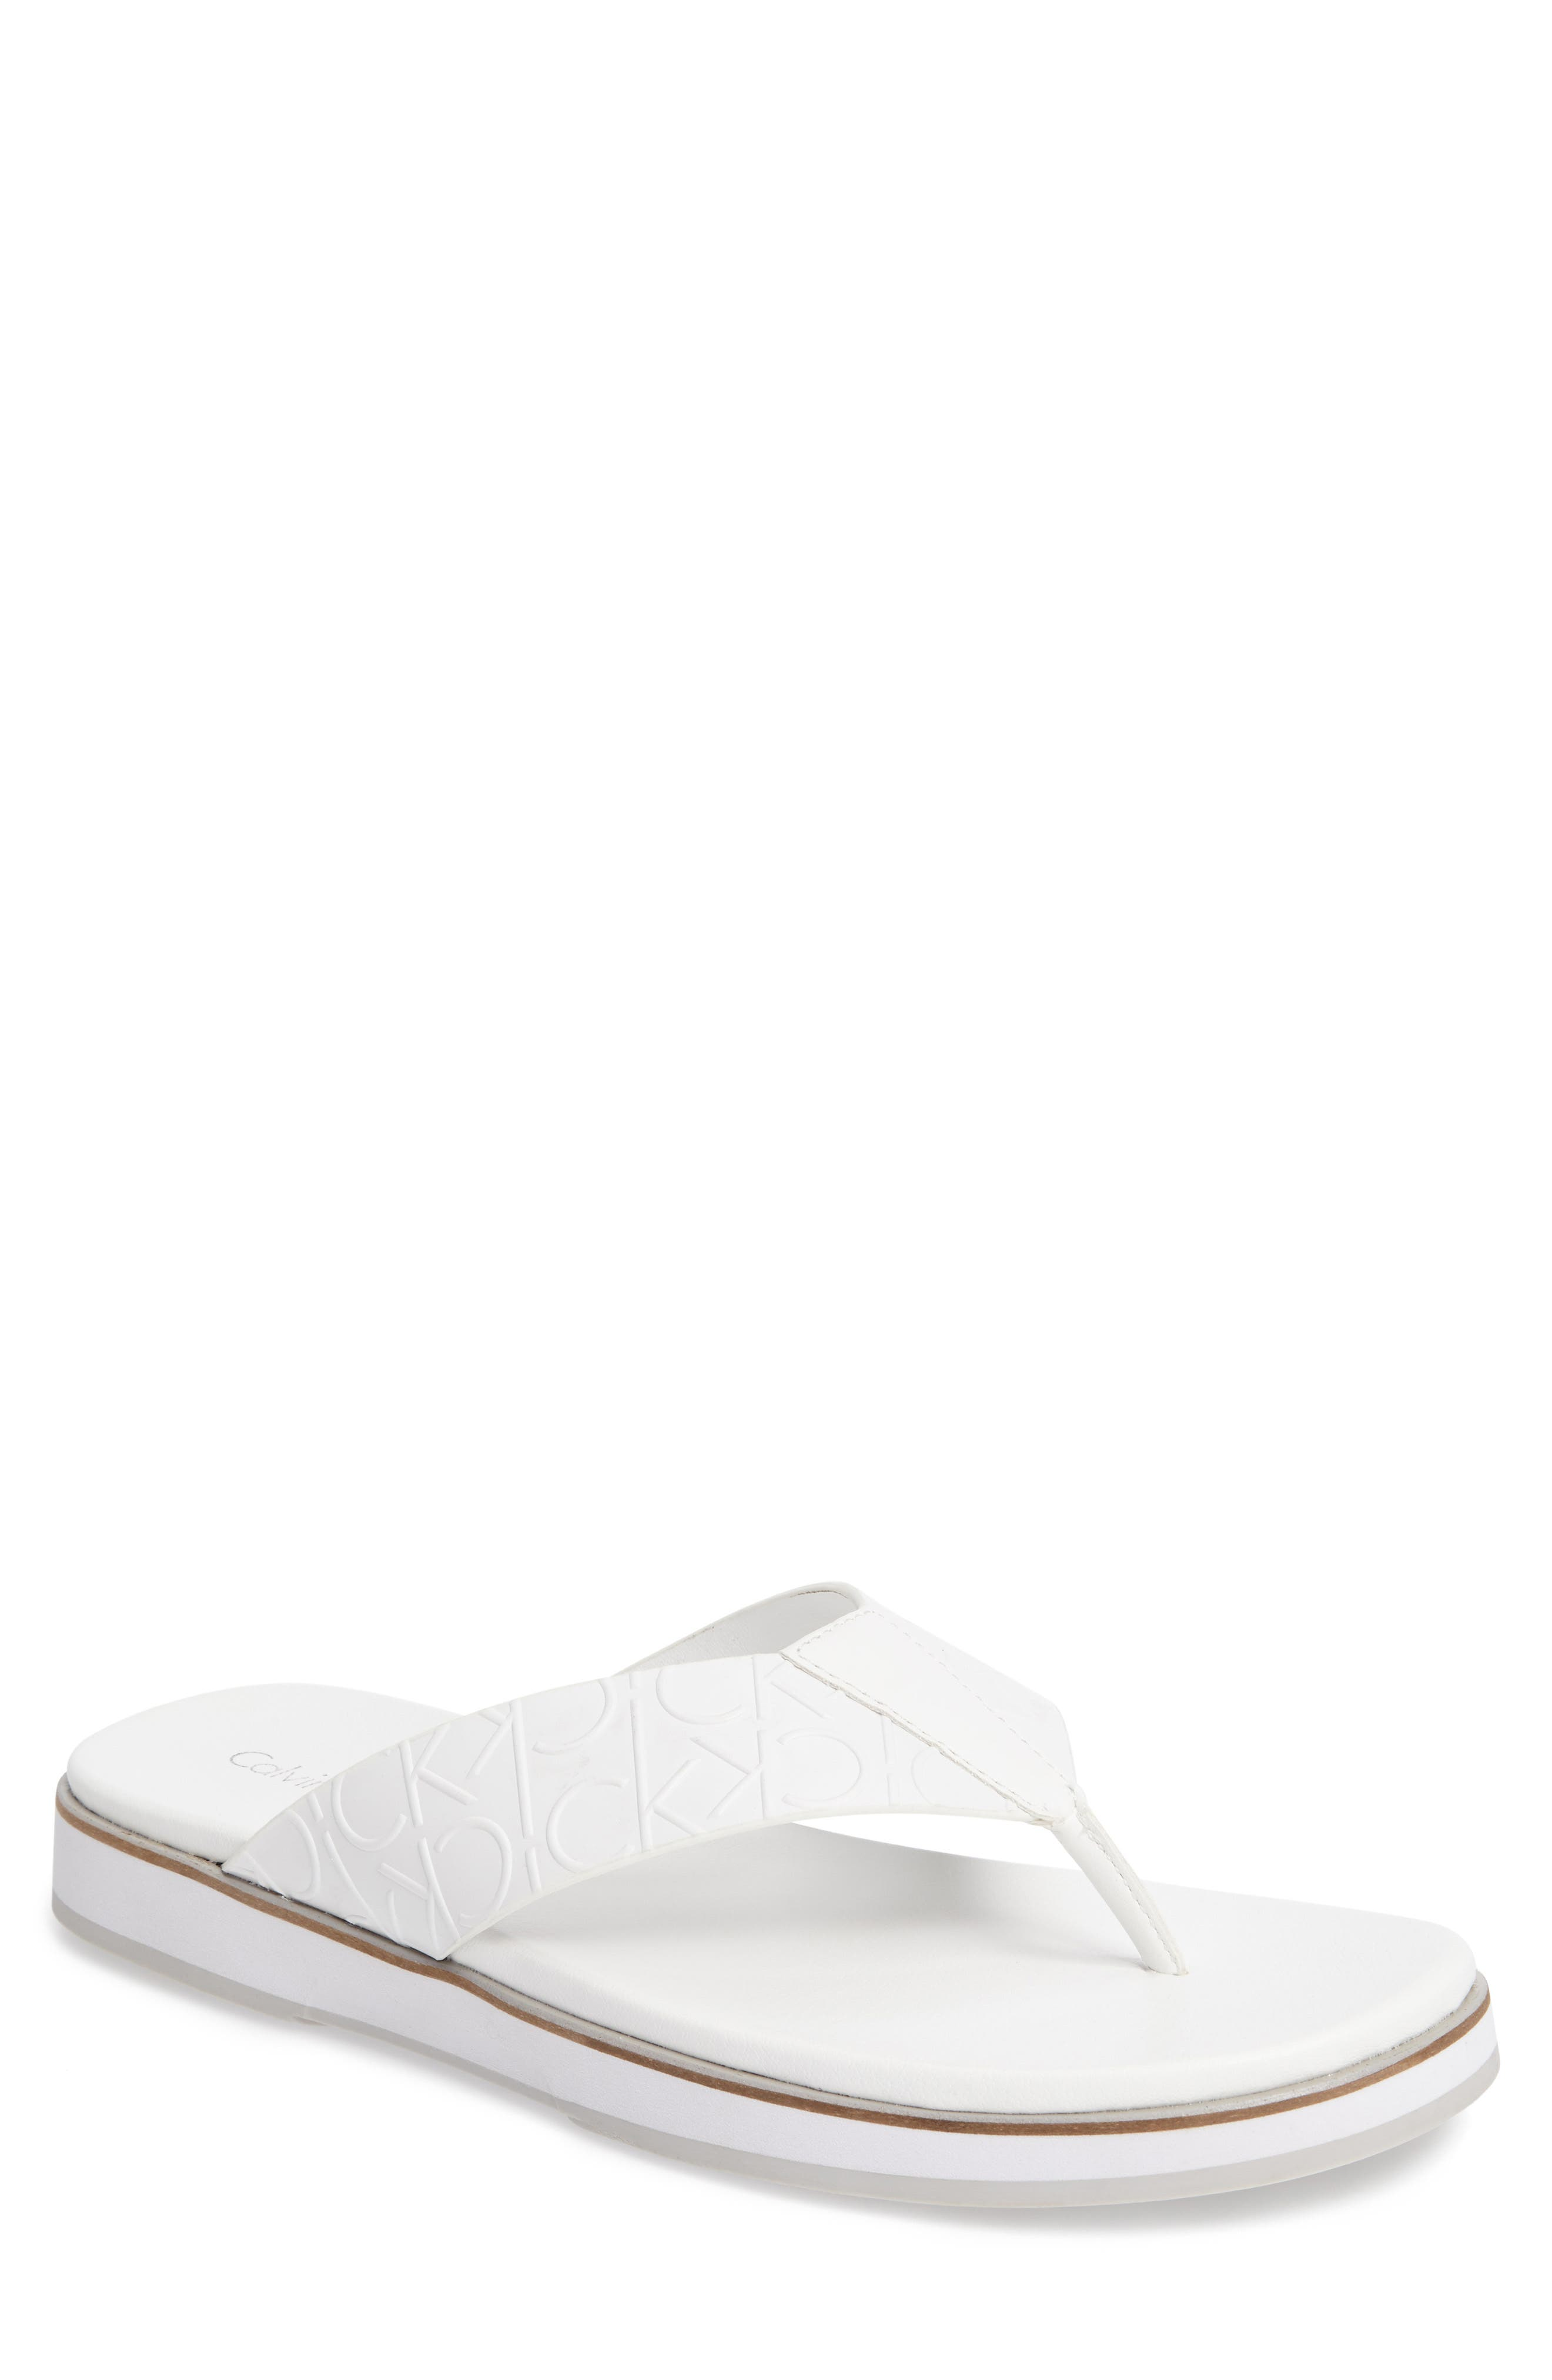 Alternate Image 1 Selected - Calvin Klein Deano Flip Flop (Men)